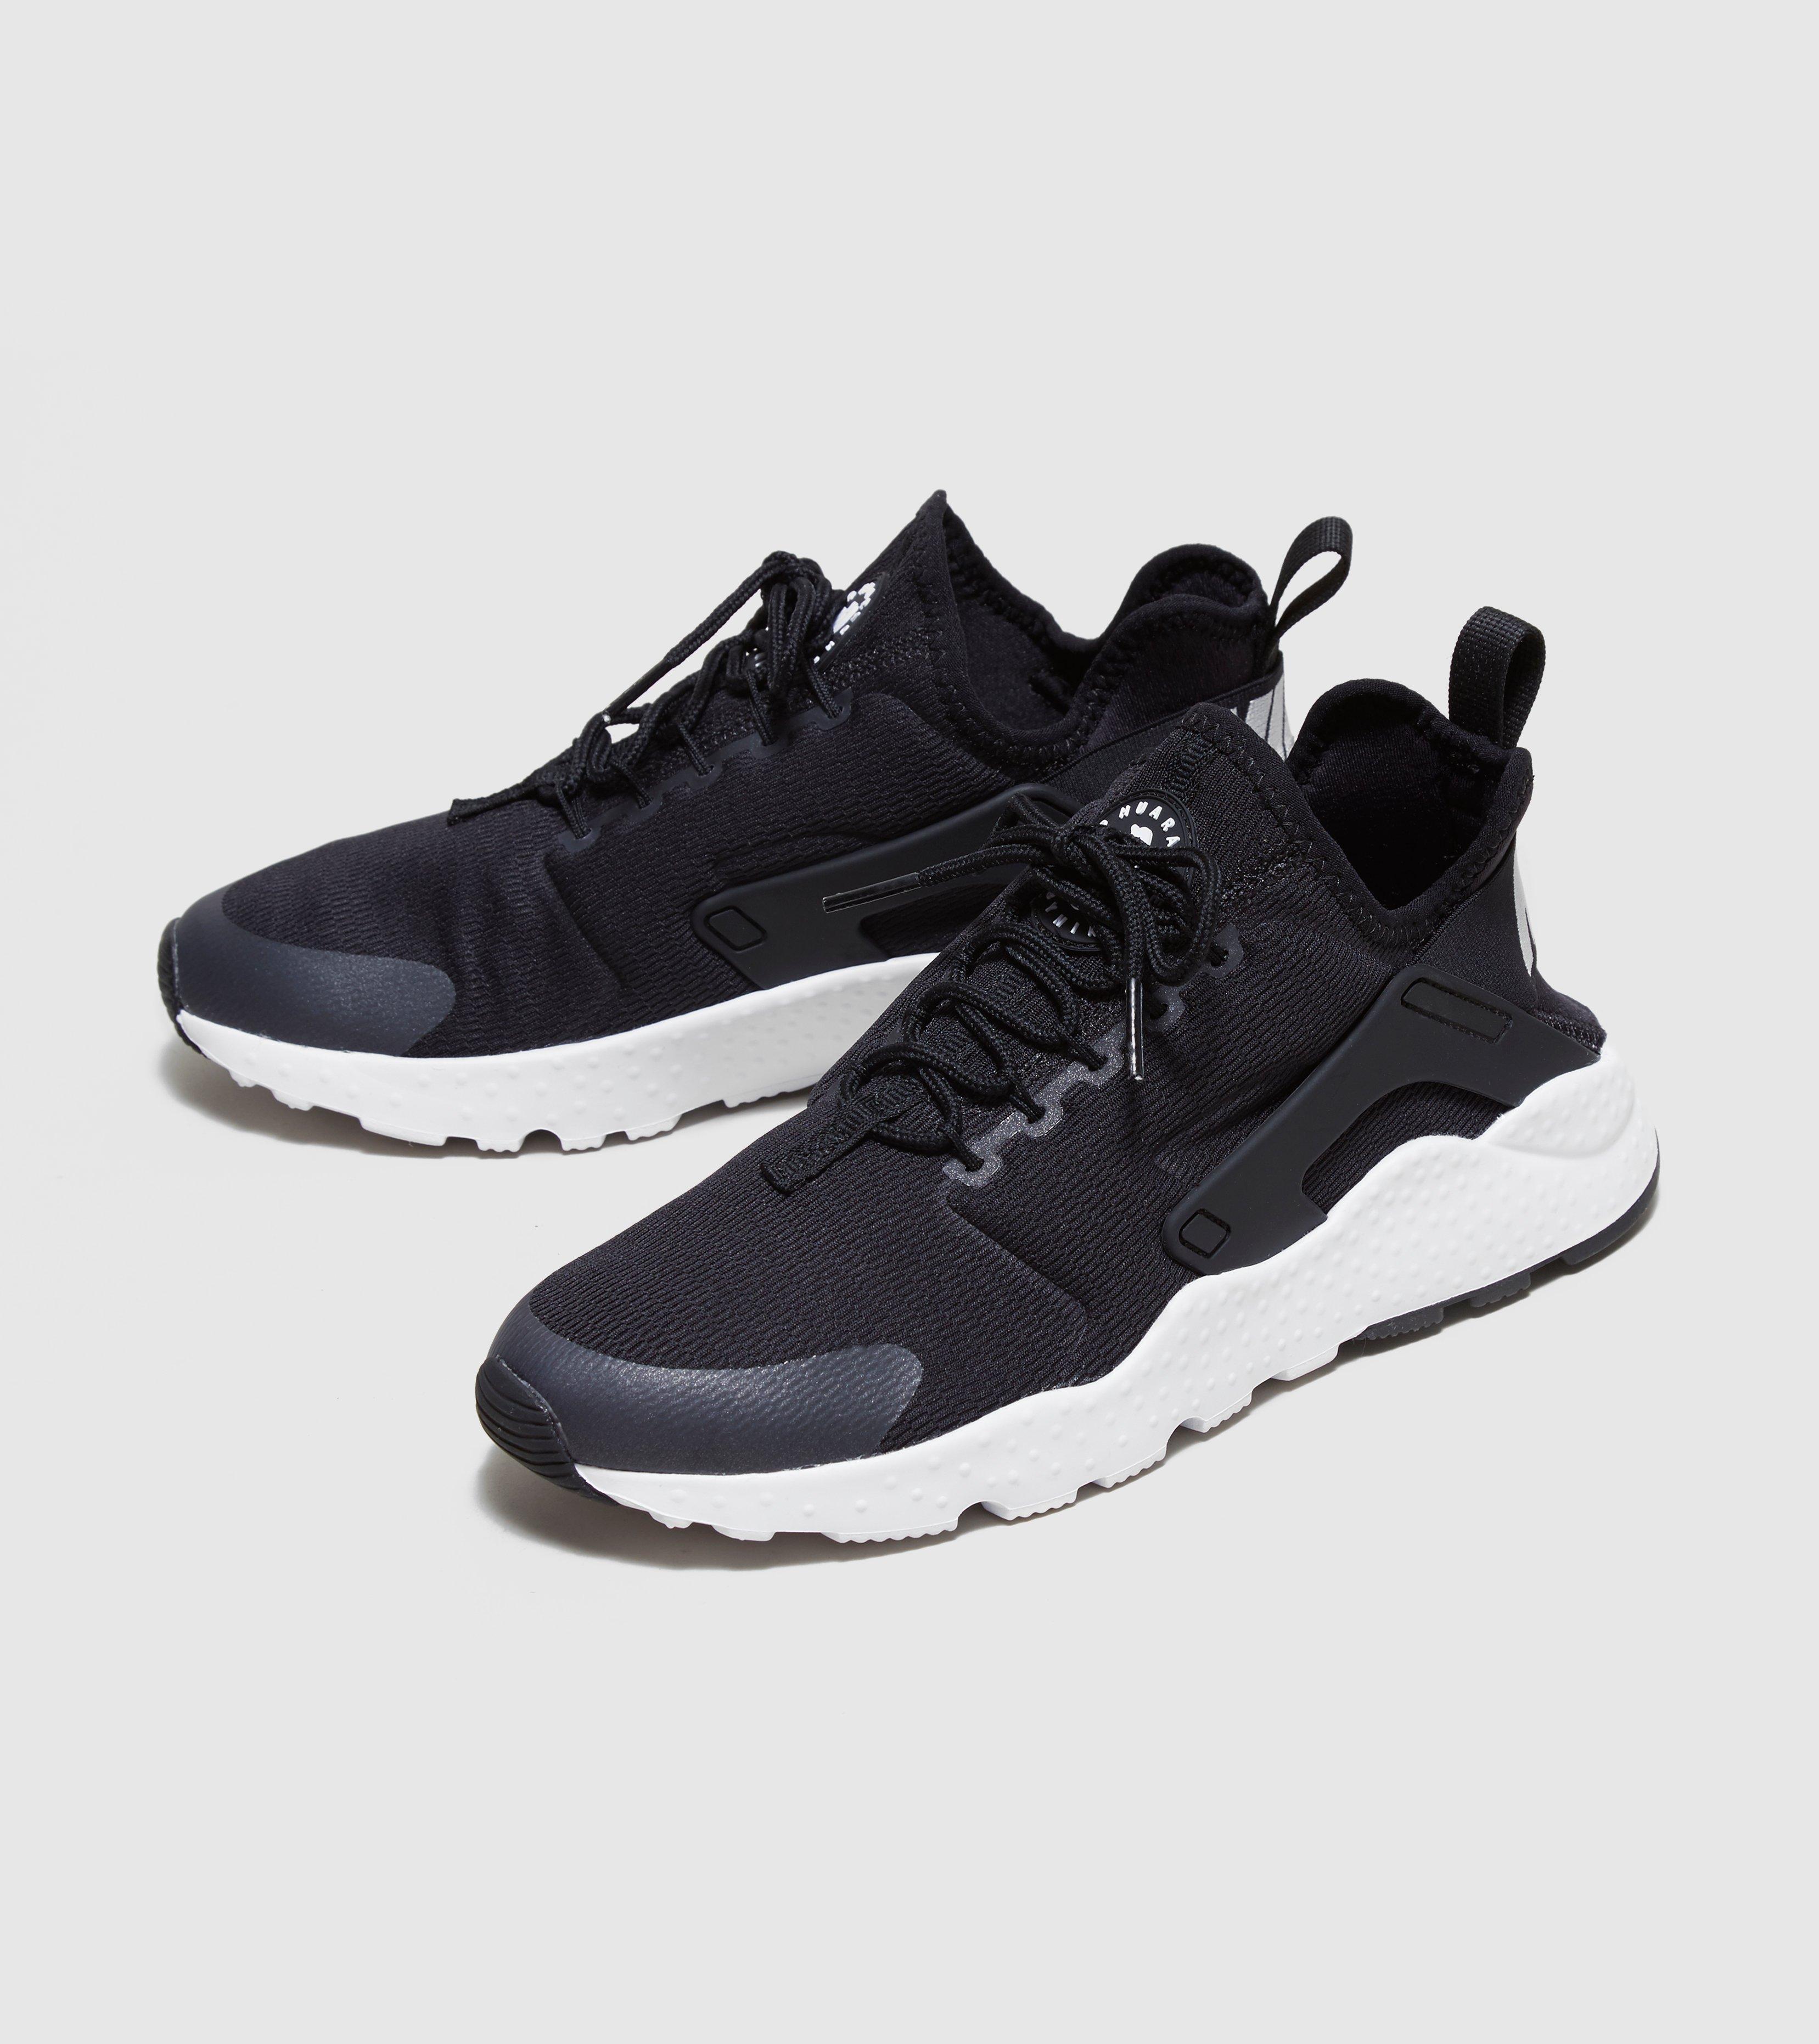 db76fc924a07 Lyst - Nike Air Huarache Ultra Women s in Black for Men